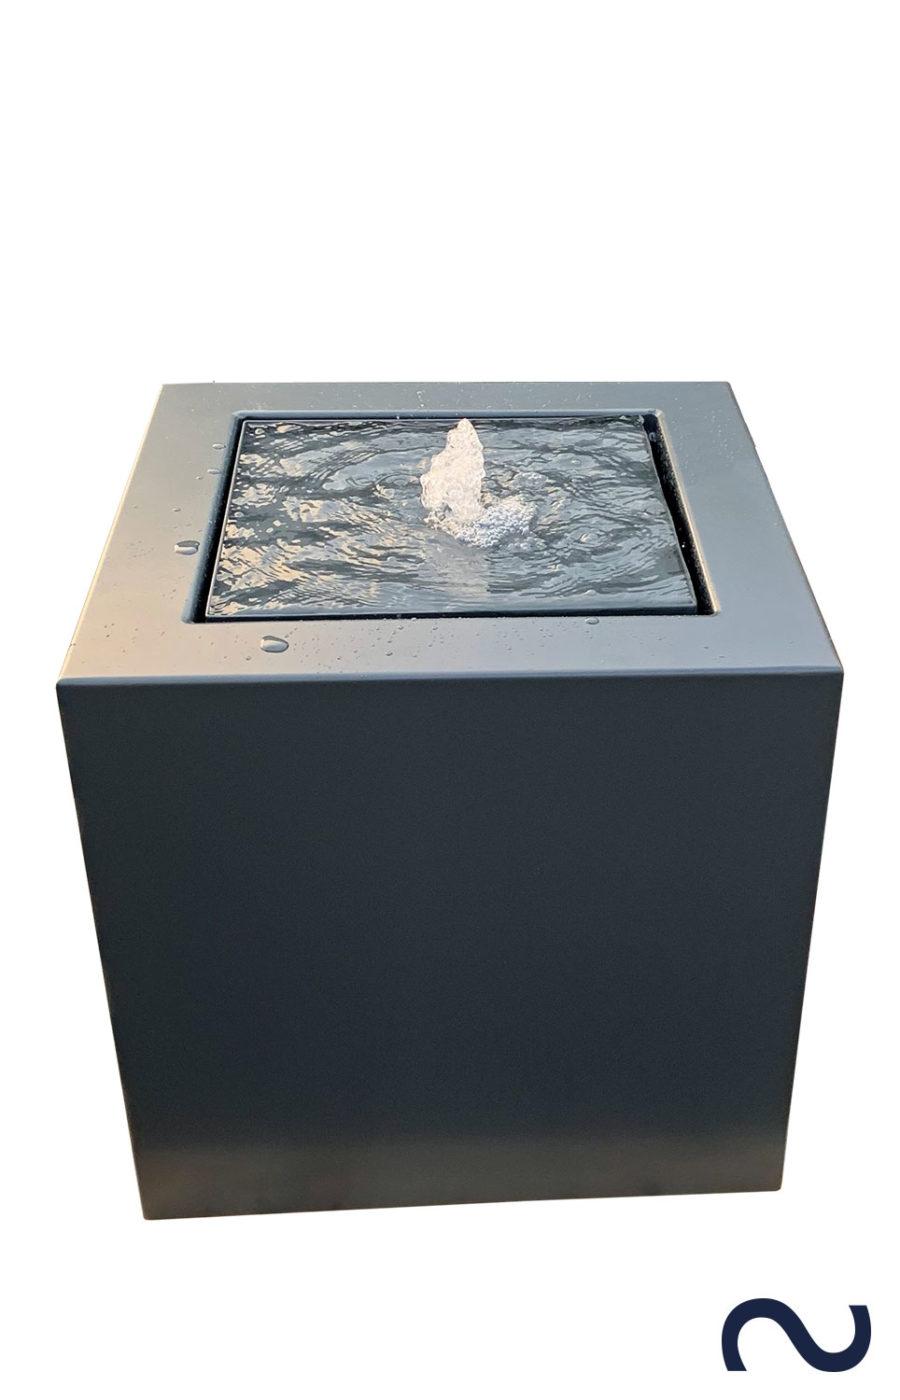 Slink Wassertisch Alubrunnen modern alu-kubus 60x60x60